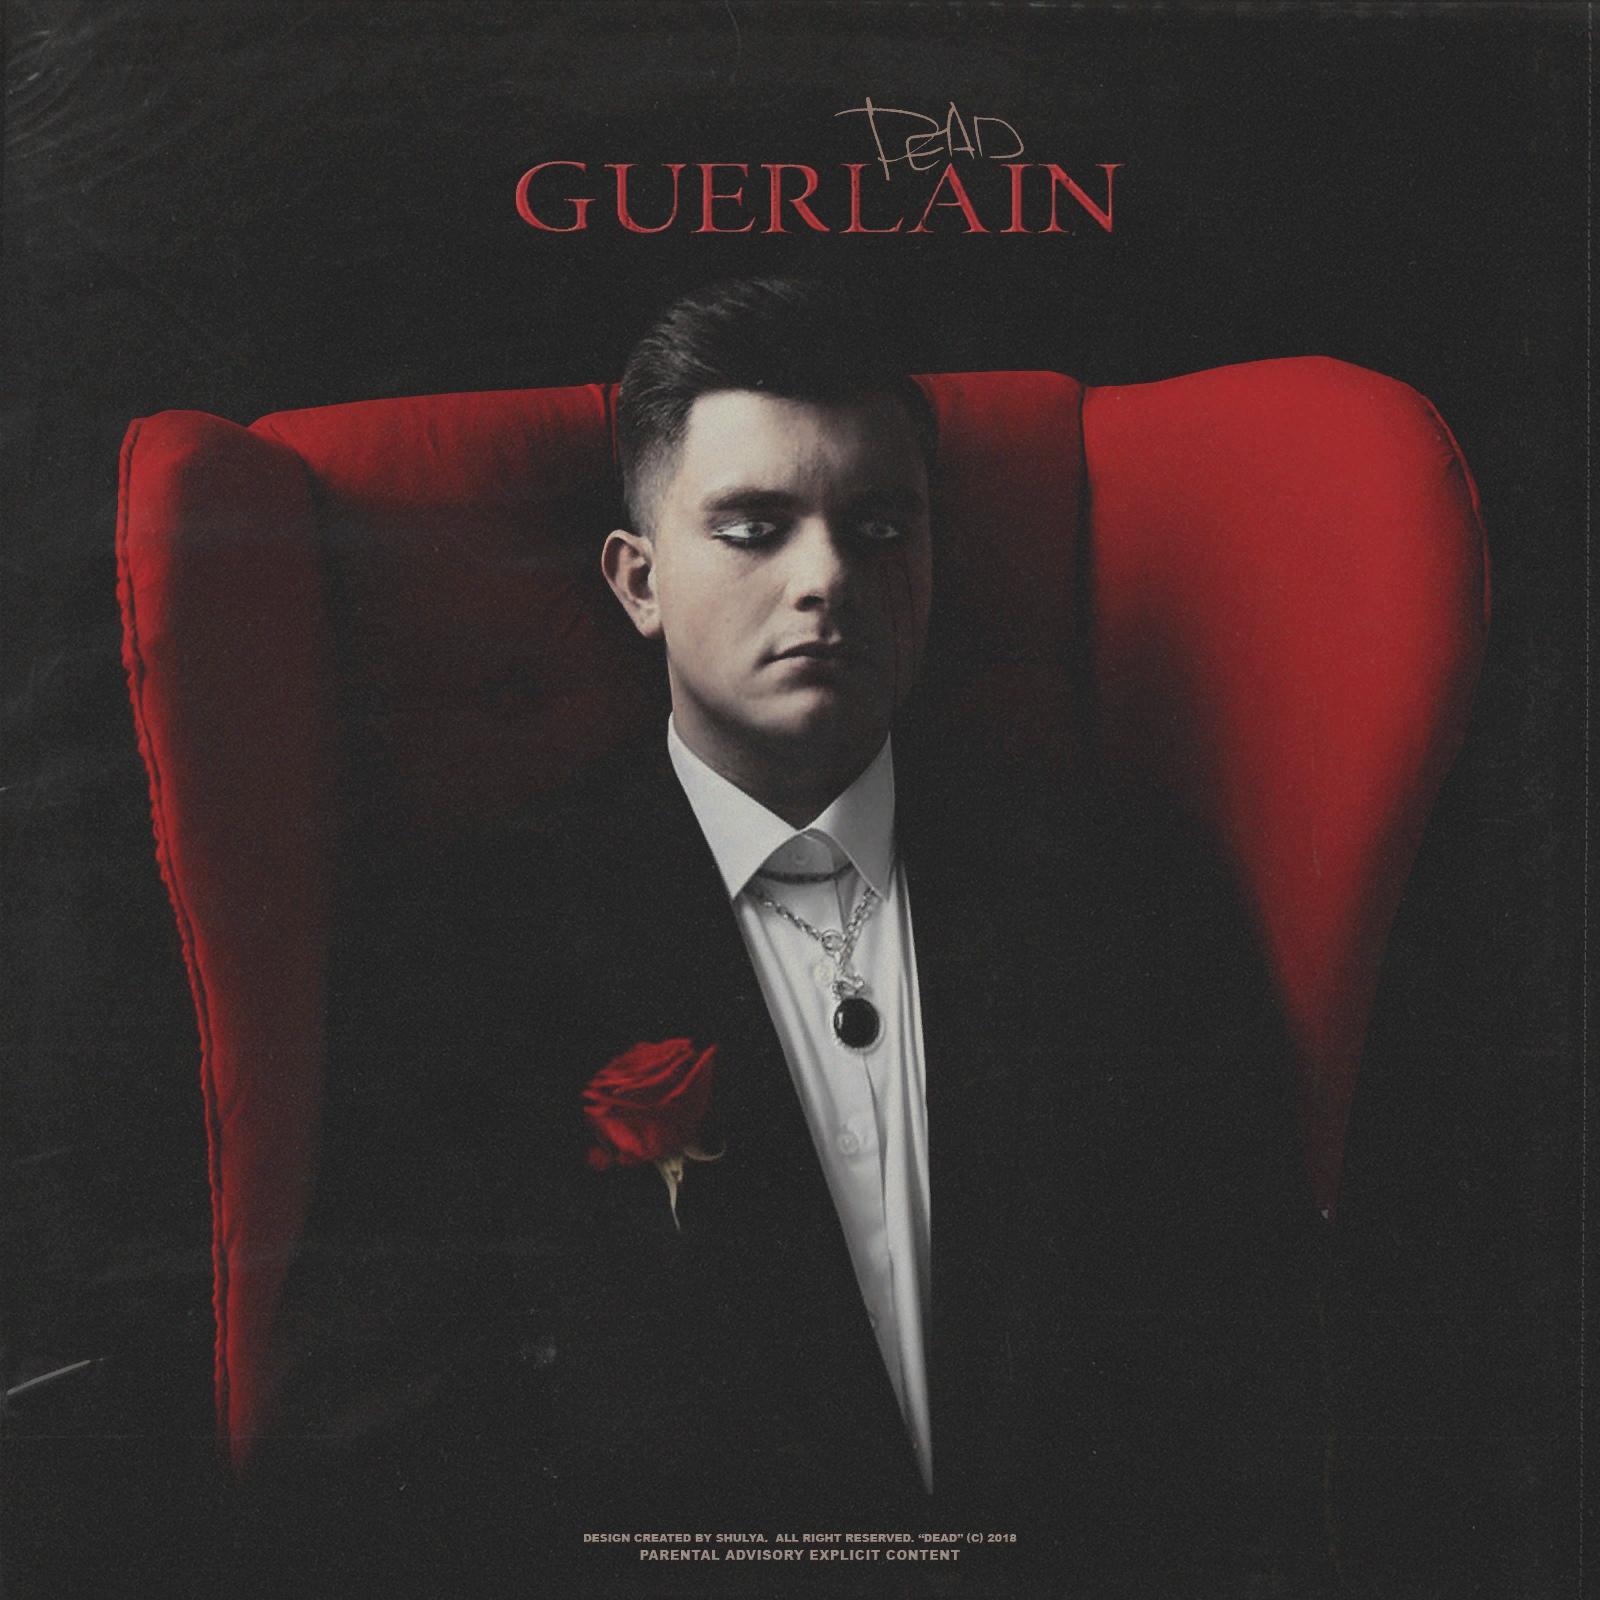 Guerlain – dead.